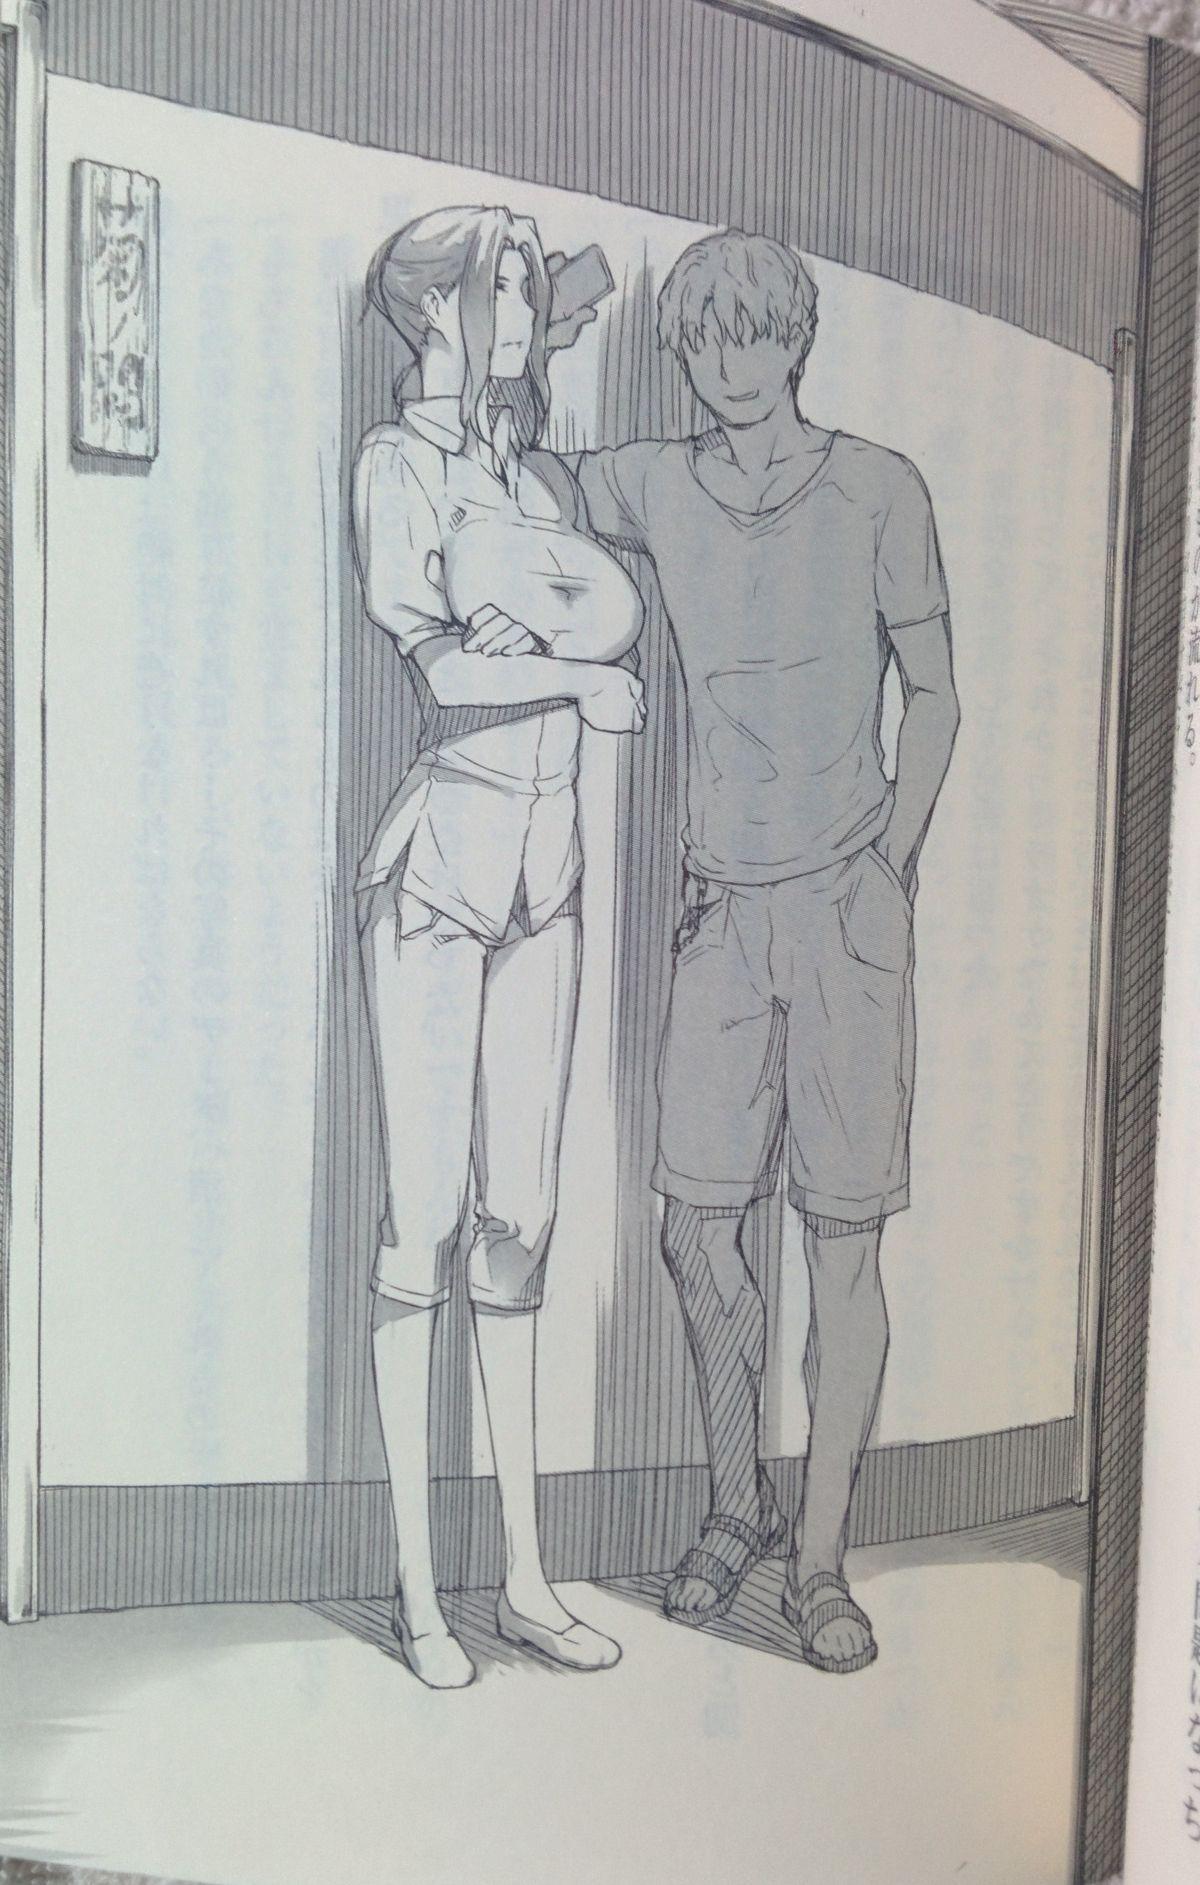 MTSP Tachibana Household's affairs with men 15